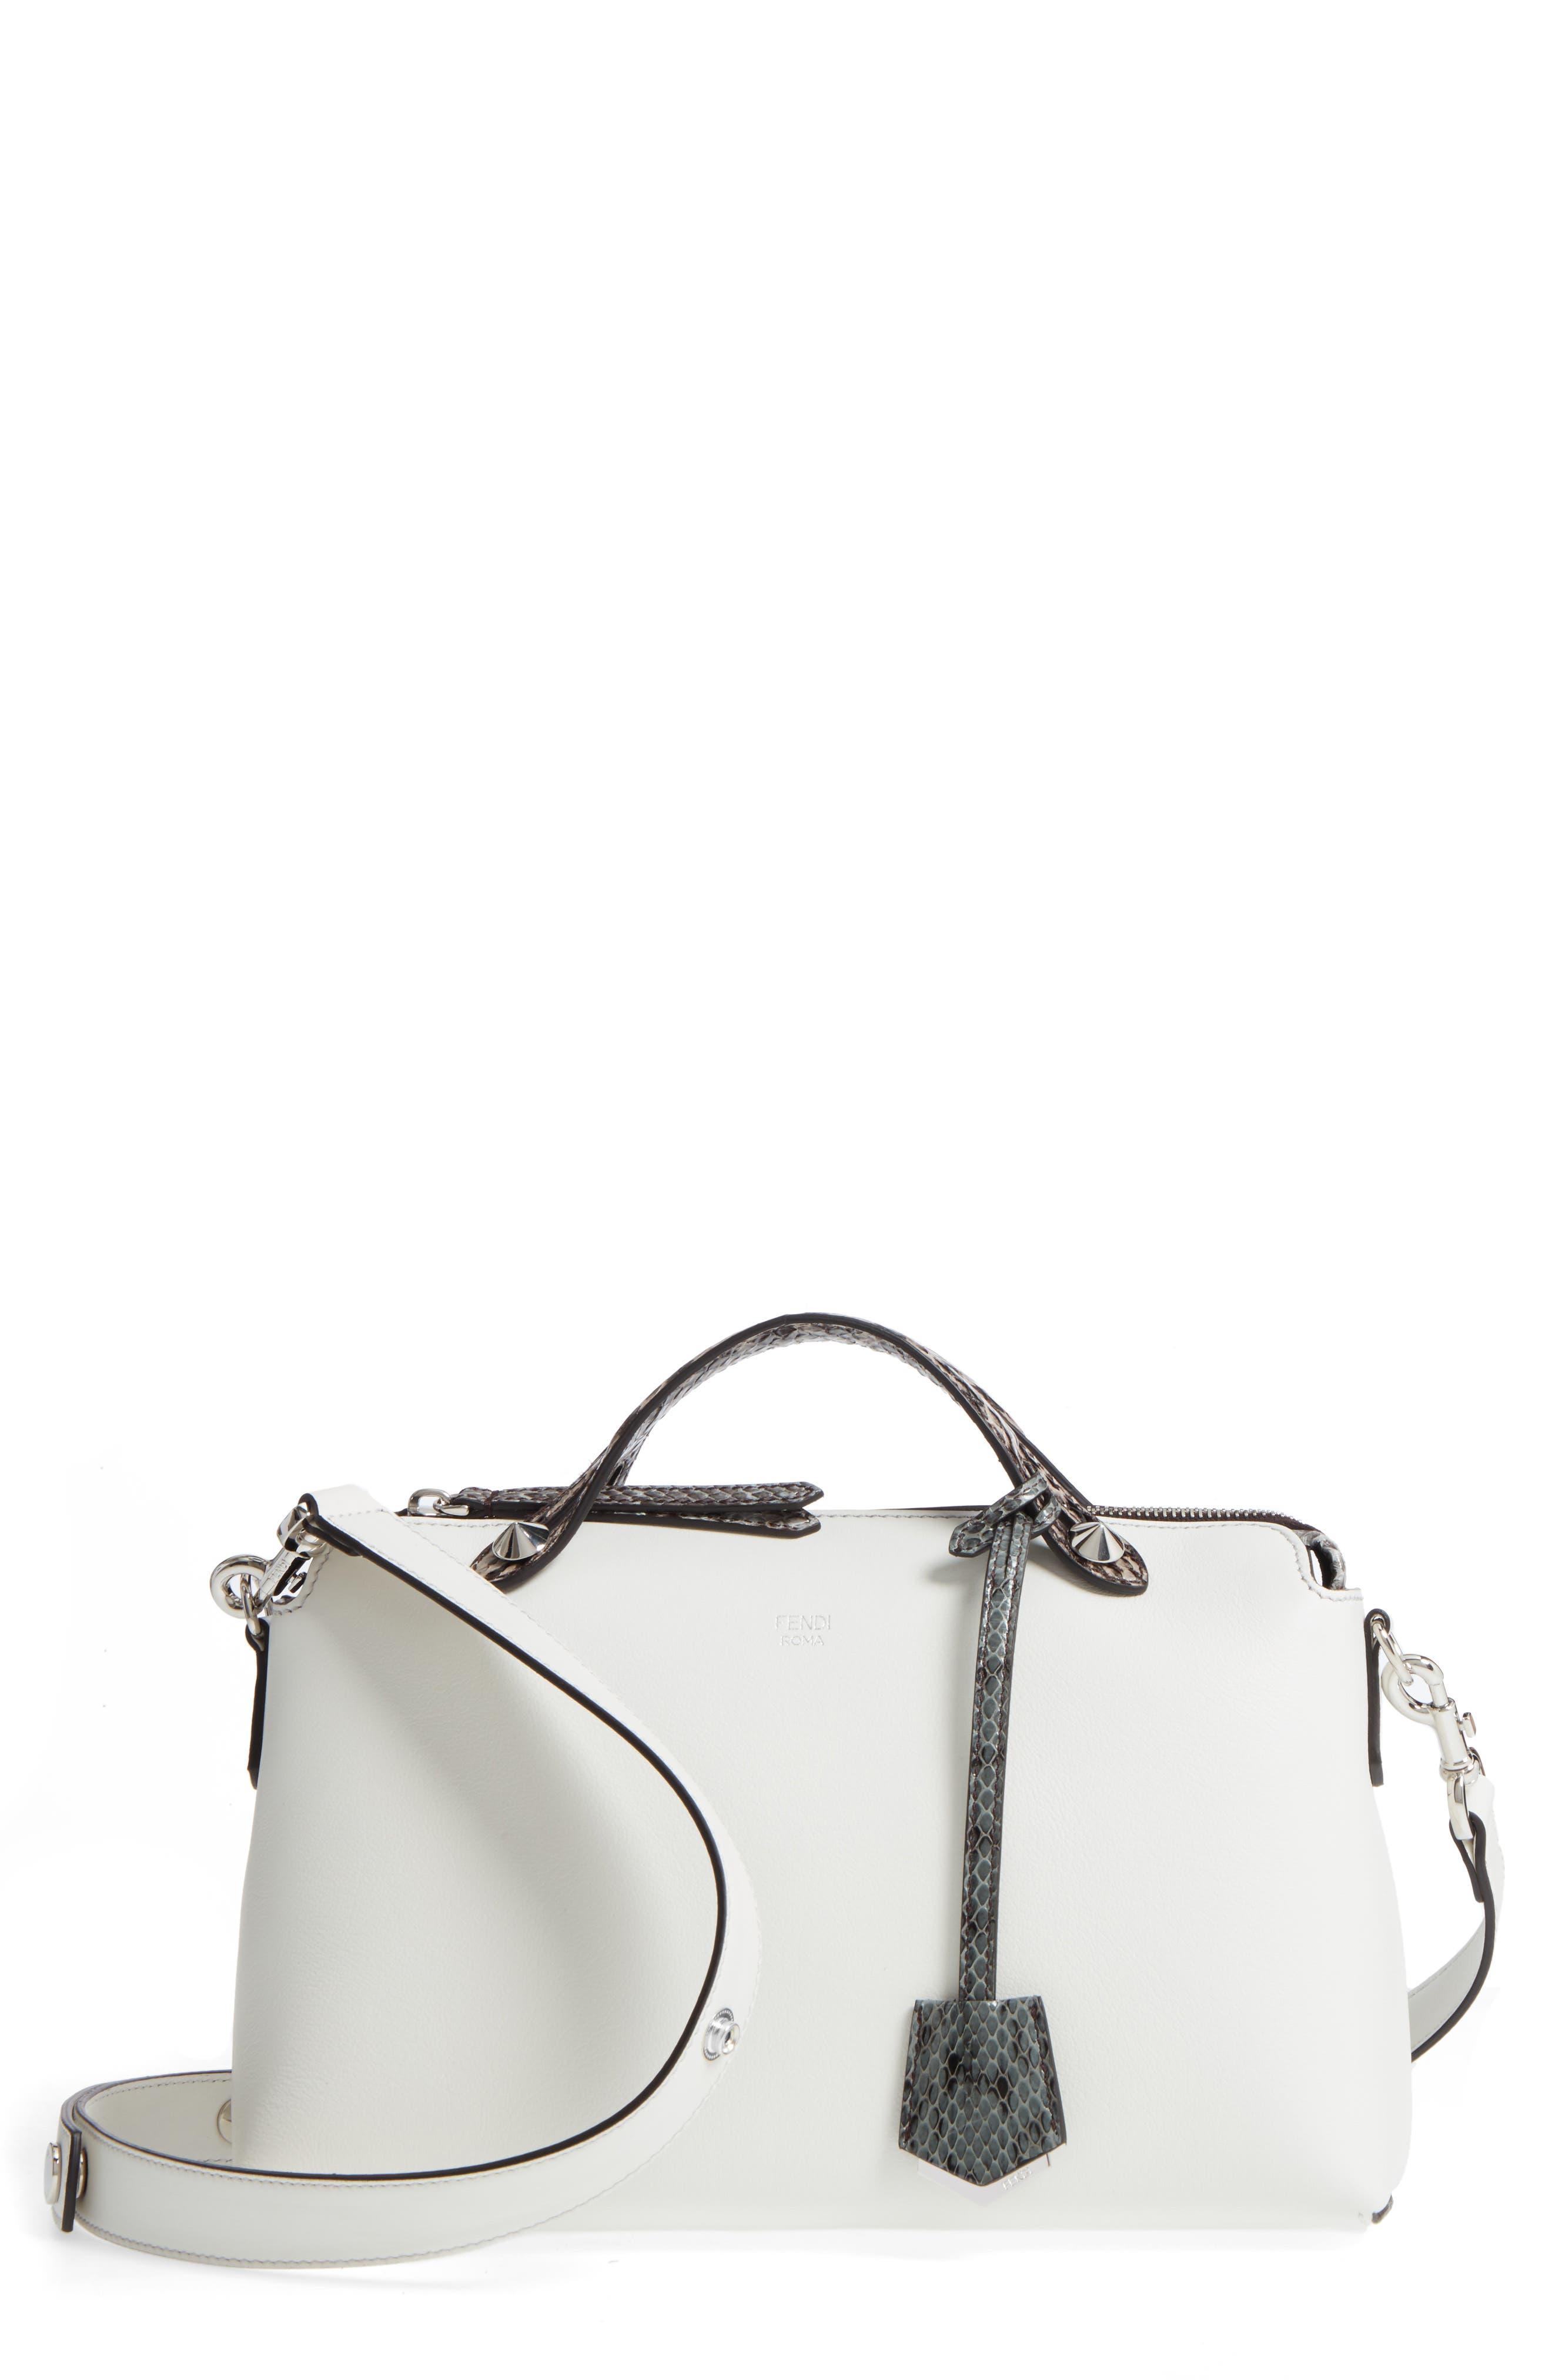 Fendi  Medium By The Way  Calfskin Leather Shoulder Bag With Genuine  Snakeskin Trim - b848a05f22